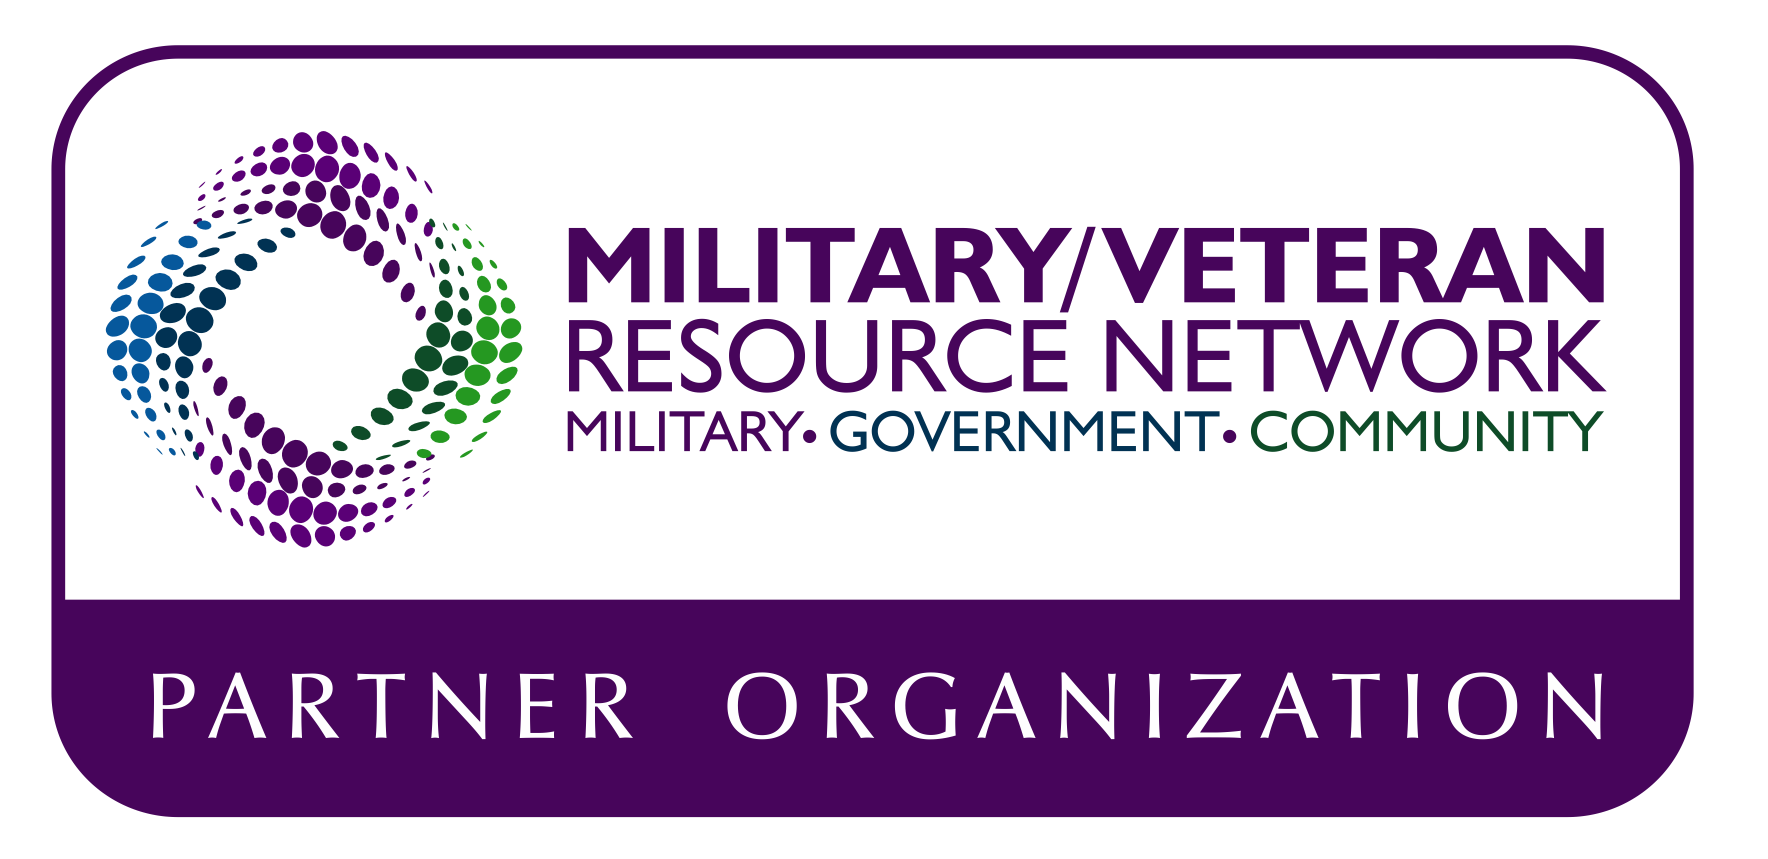 Military/Veteran Resource Network